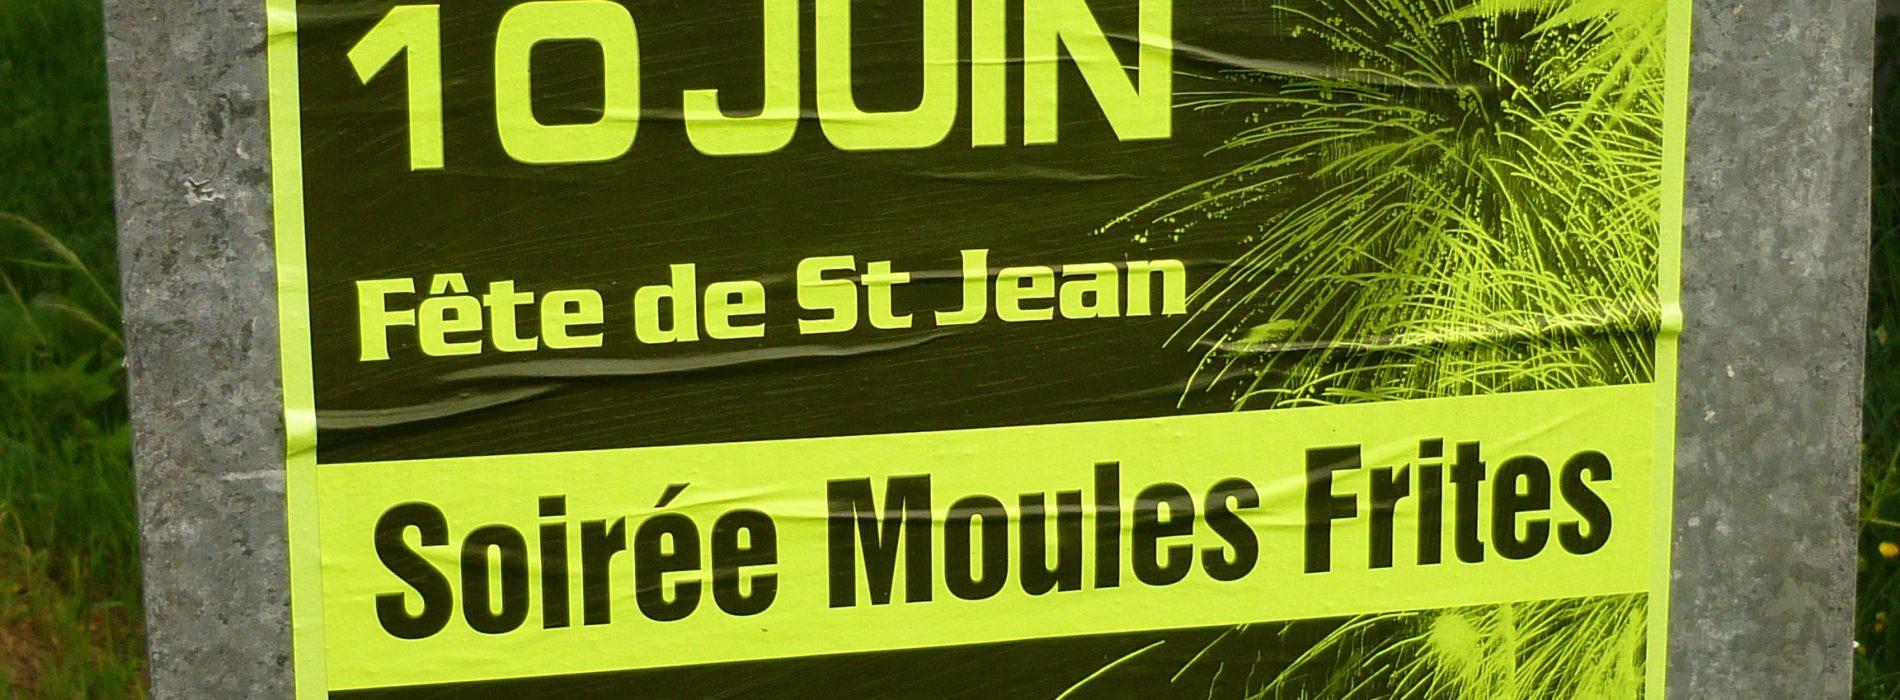 SOIREE MOULES FRITES LE SAMEDI 10 JUIN 2017